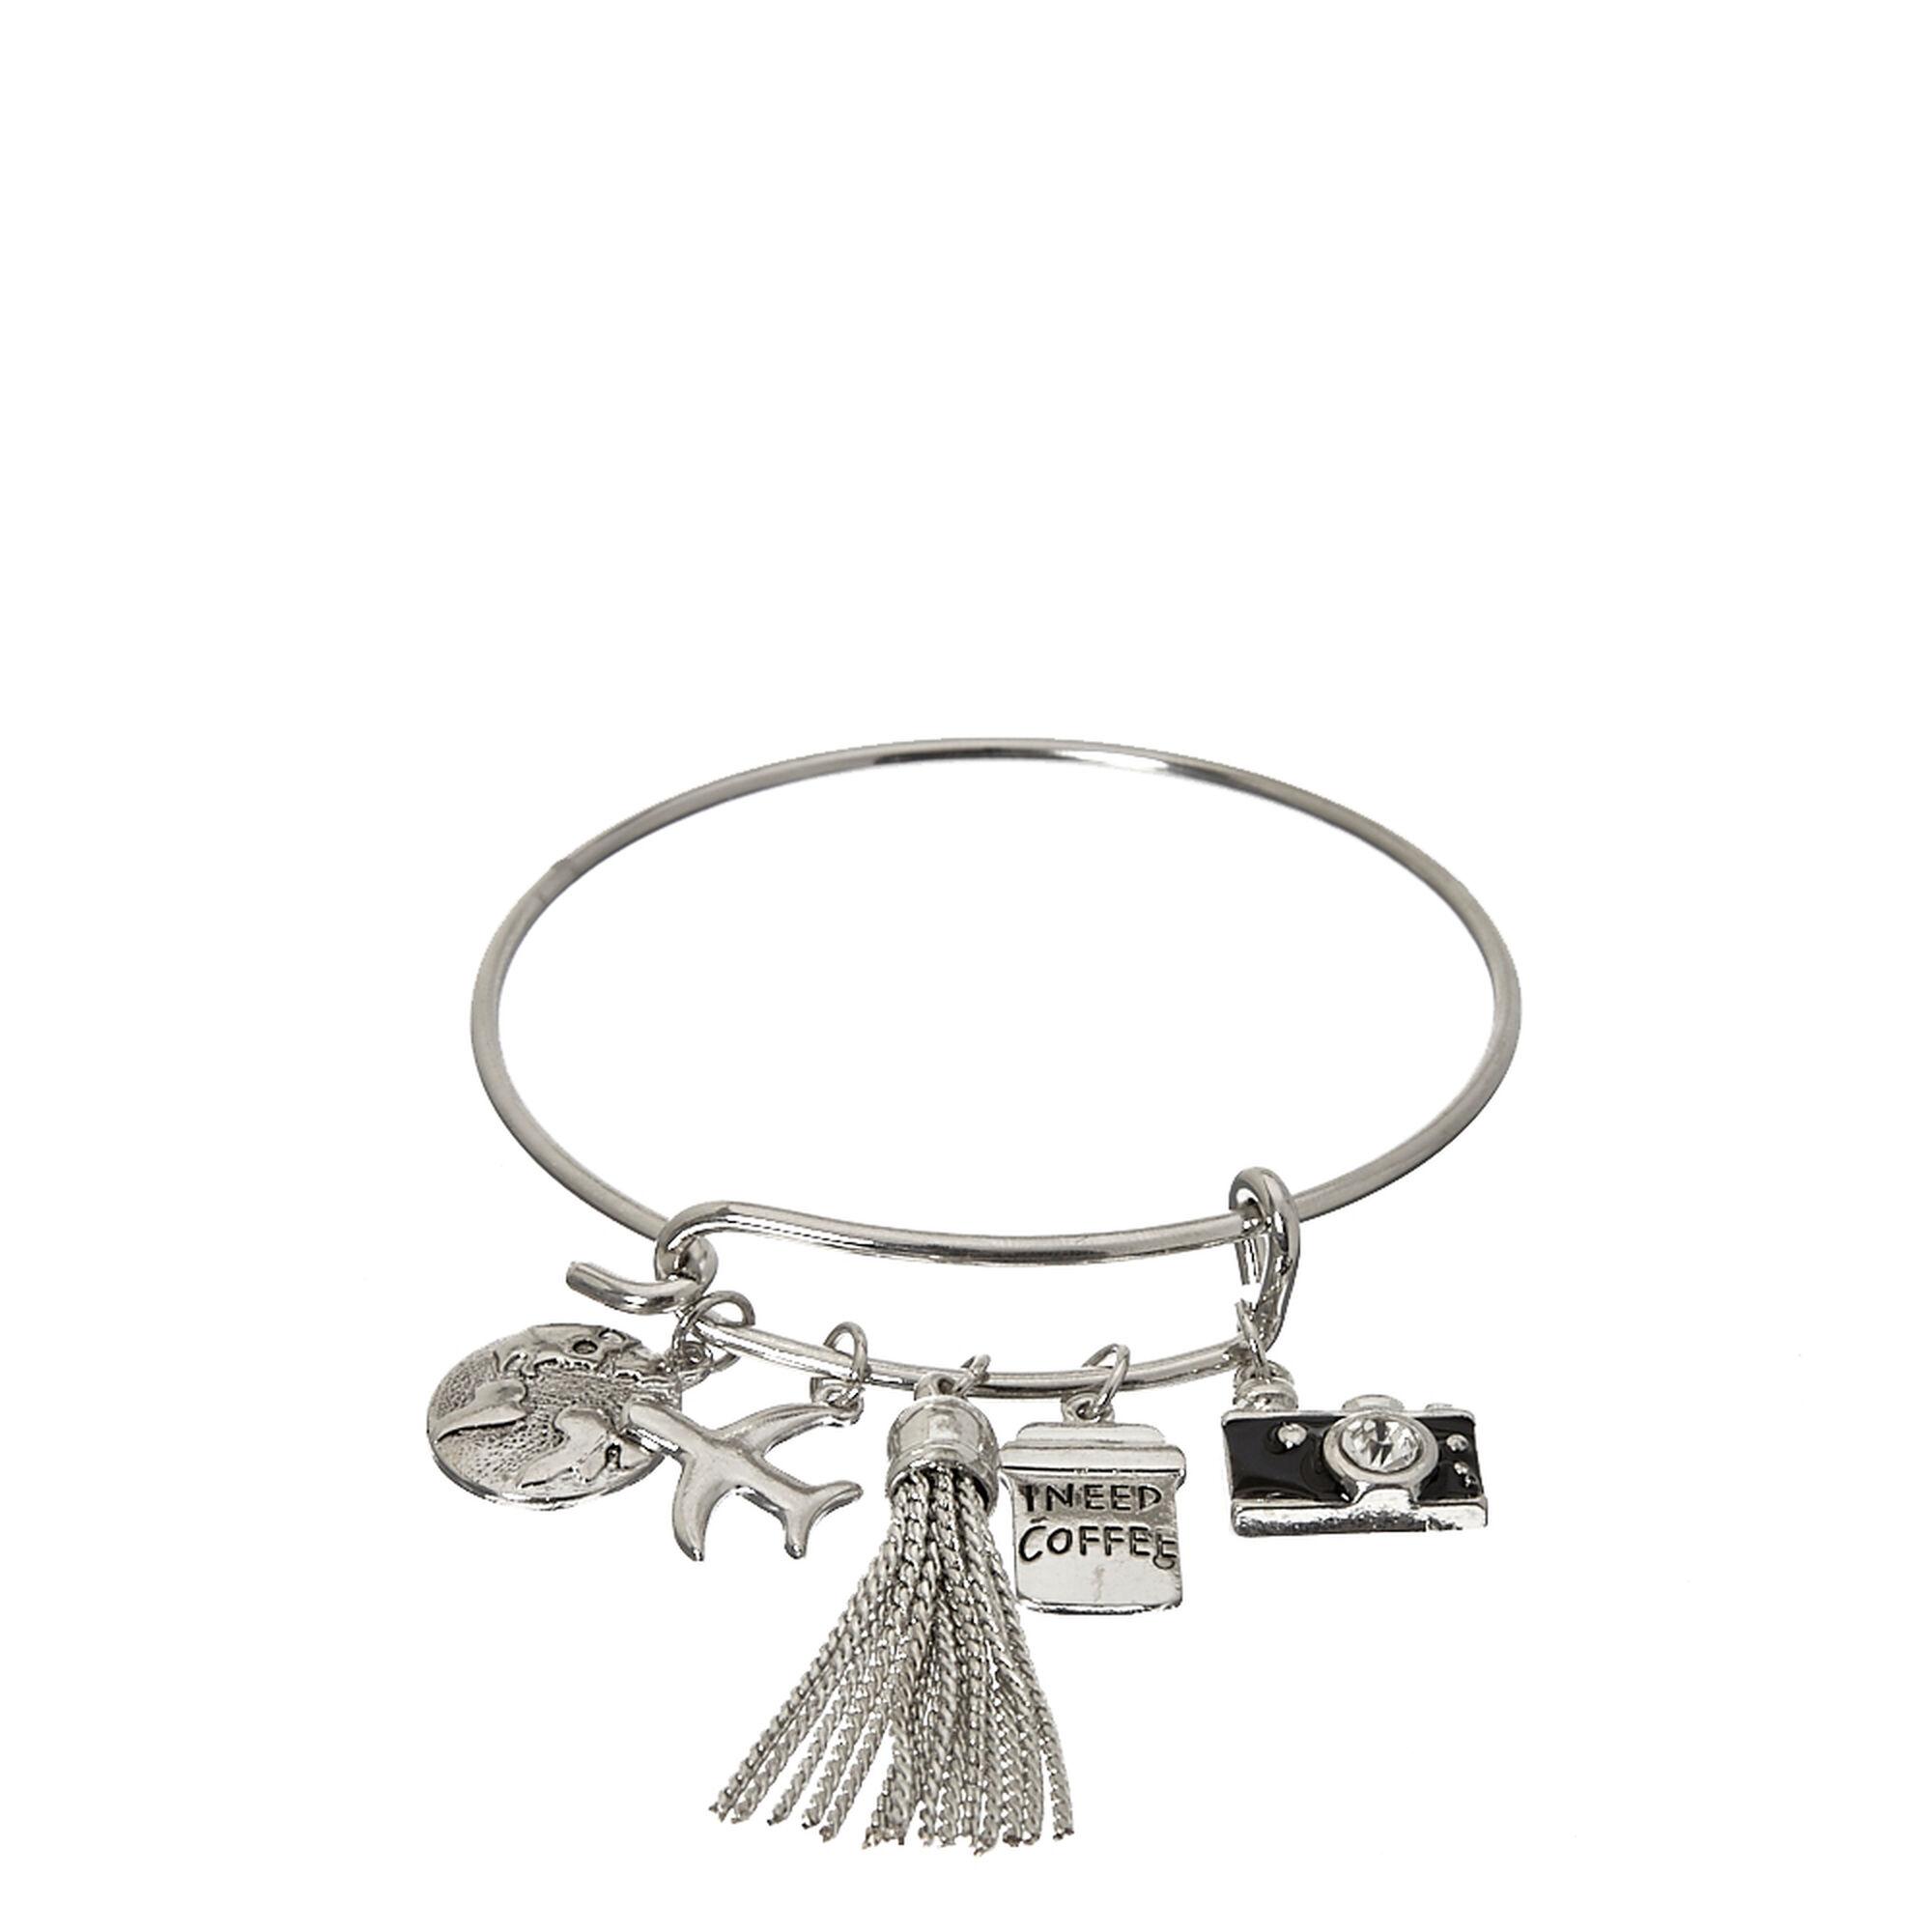 Silver Tone Travel Charm Bangle Bracelet